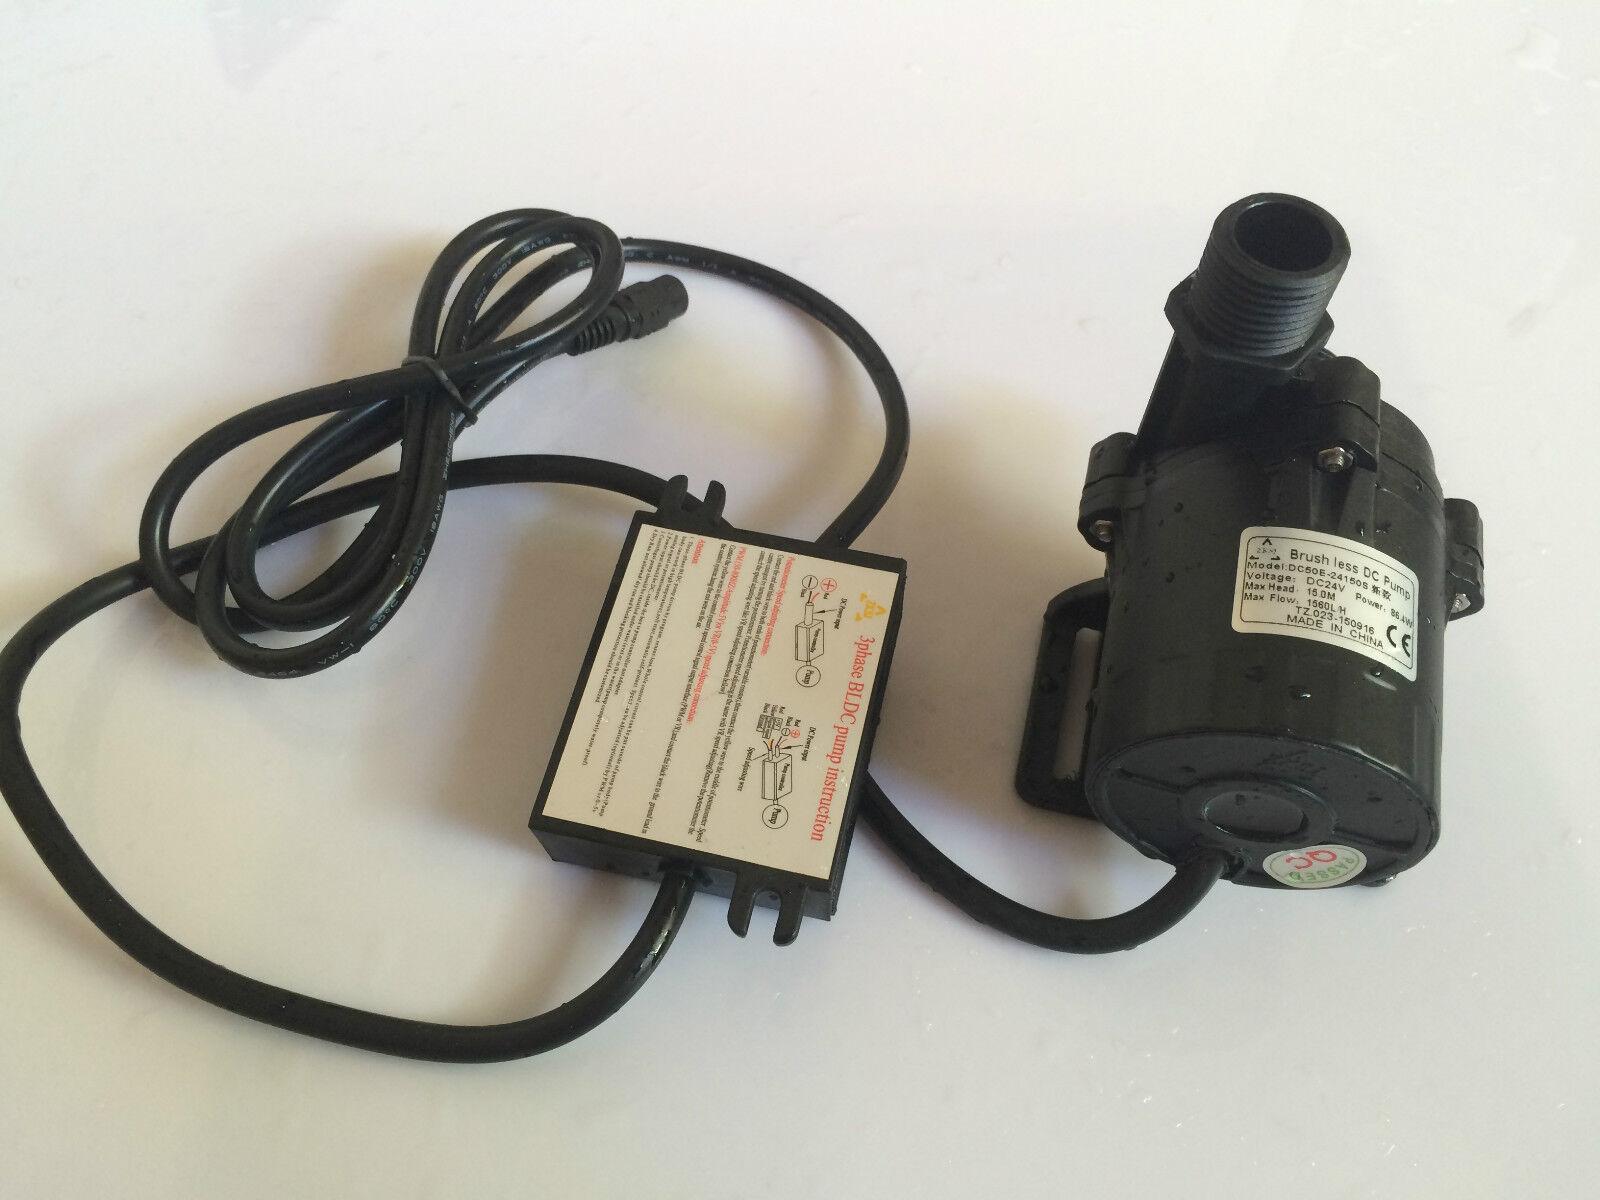 24V DC micro bomba de agua sumergible bomba de agua, 1200LPH, 15M para ciclo agua Sys